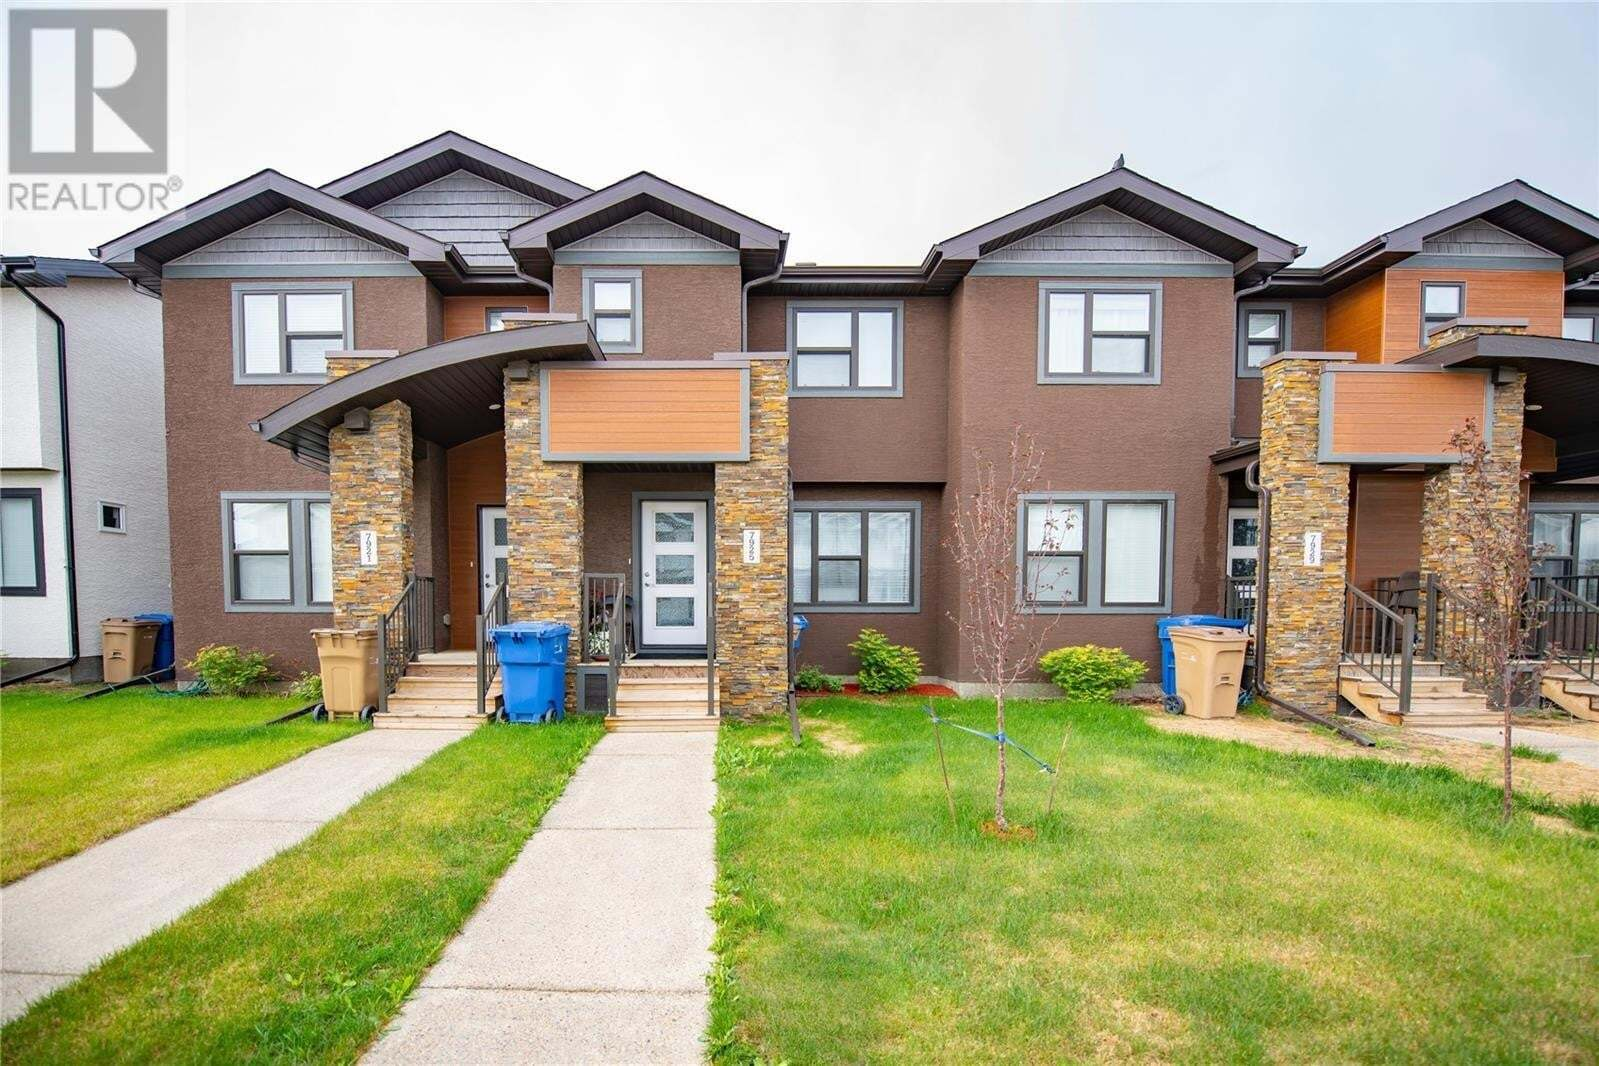 Townhouse for sale at 7925 Canola Ave Regina Saskatchewan - MLS: SK813451